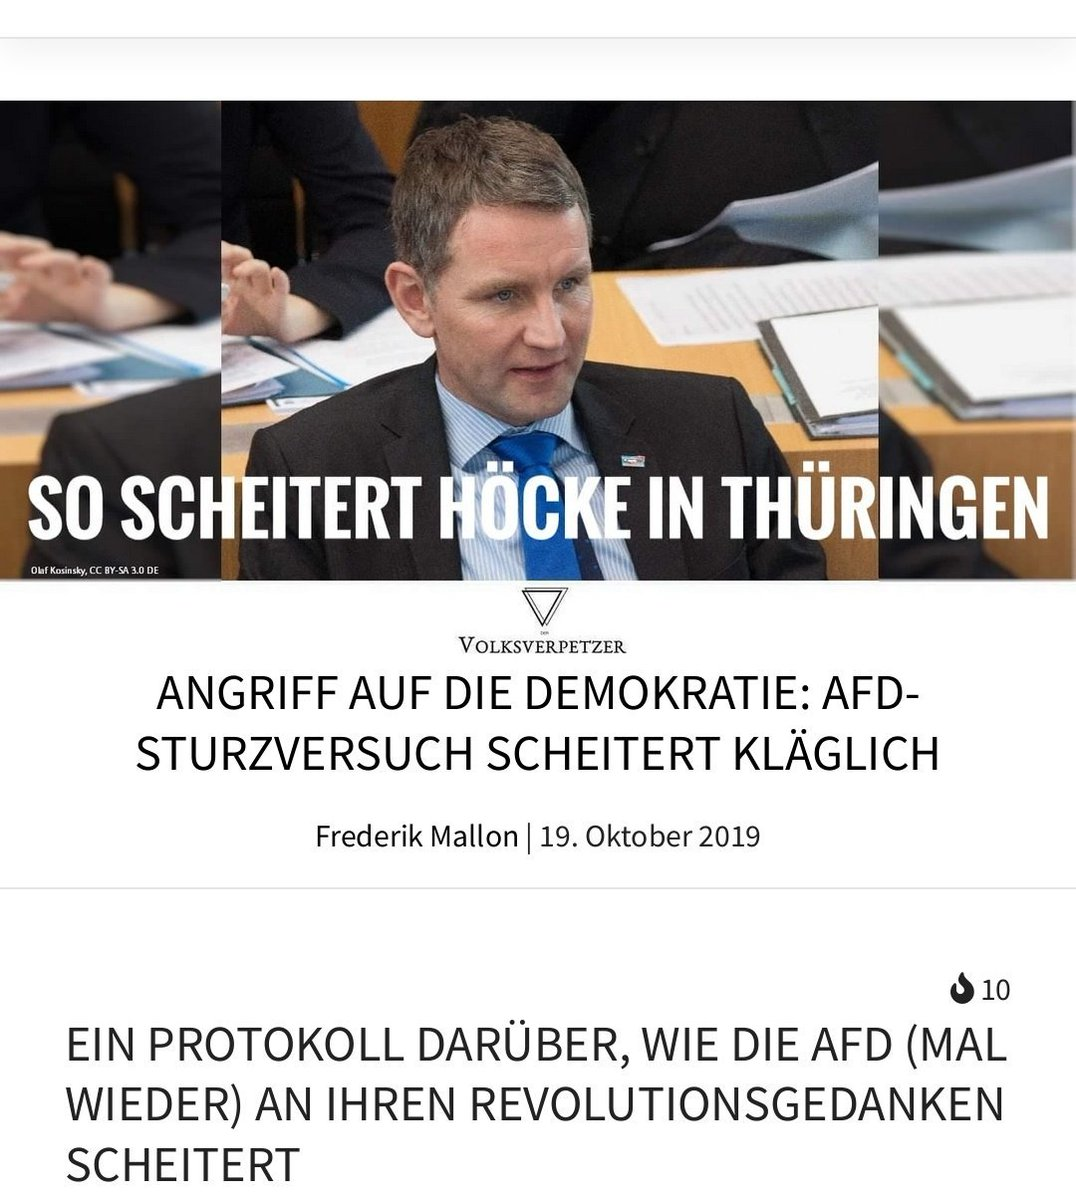 https://www. volksverpetzer.de/politik/demokr atie-gegen-rechts/  …   Lesenswert  #noafd #afdwirkt #gegenrechts #nonazis #nonazisdo #sogafd #fckafd #fckNazis #nazisraus  #afdverbot #kreuzacht #riegel_vor #Thueringen<br>http://pic.twitter.com/JAjUOe2vTu